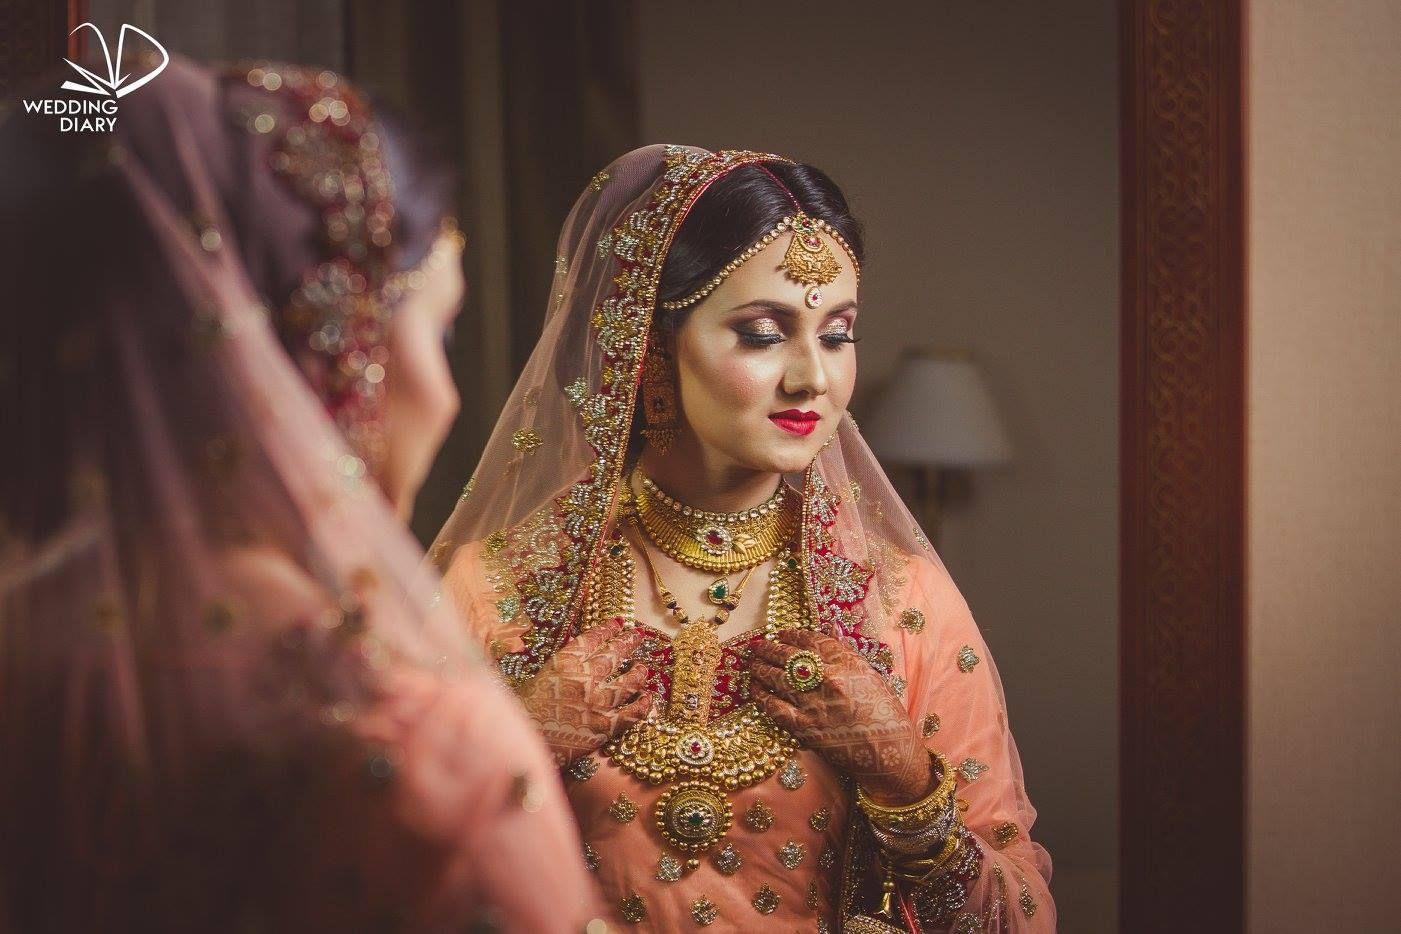 wedding diary bangladesh   bangladeshi wedding   indian